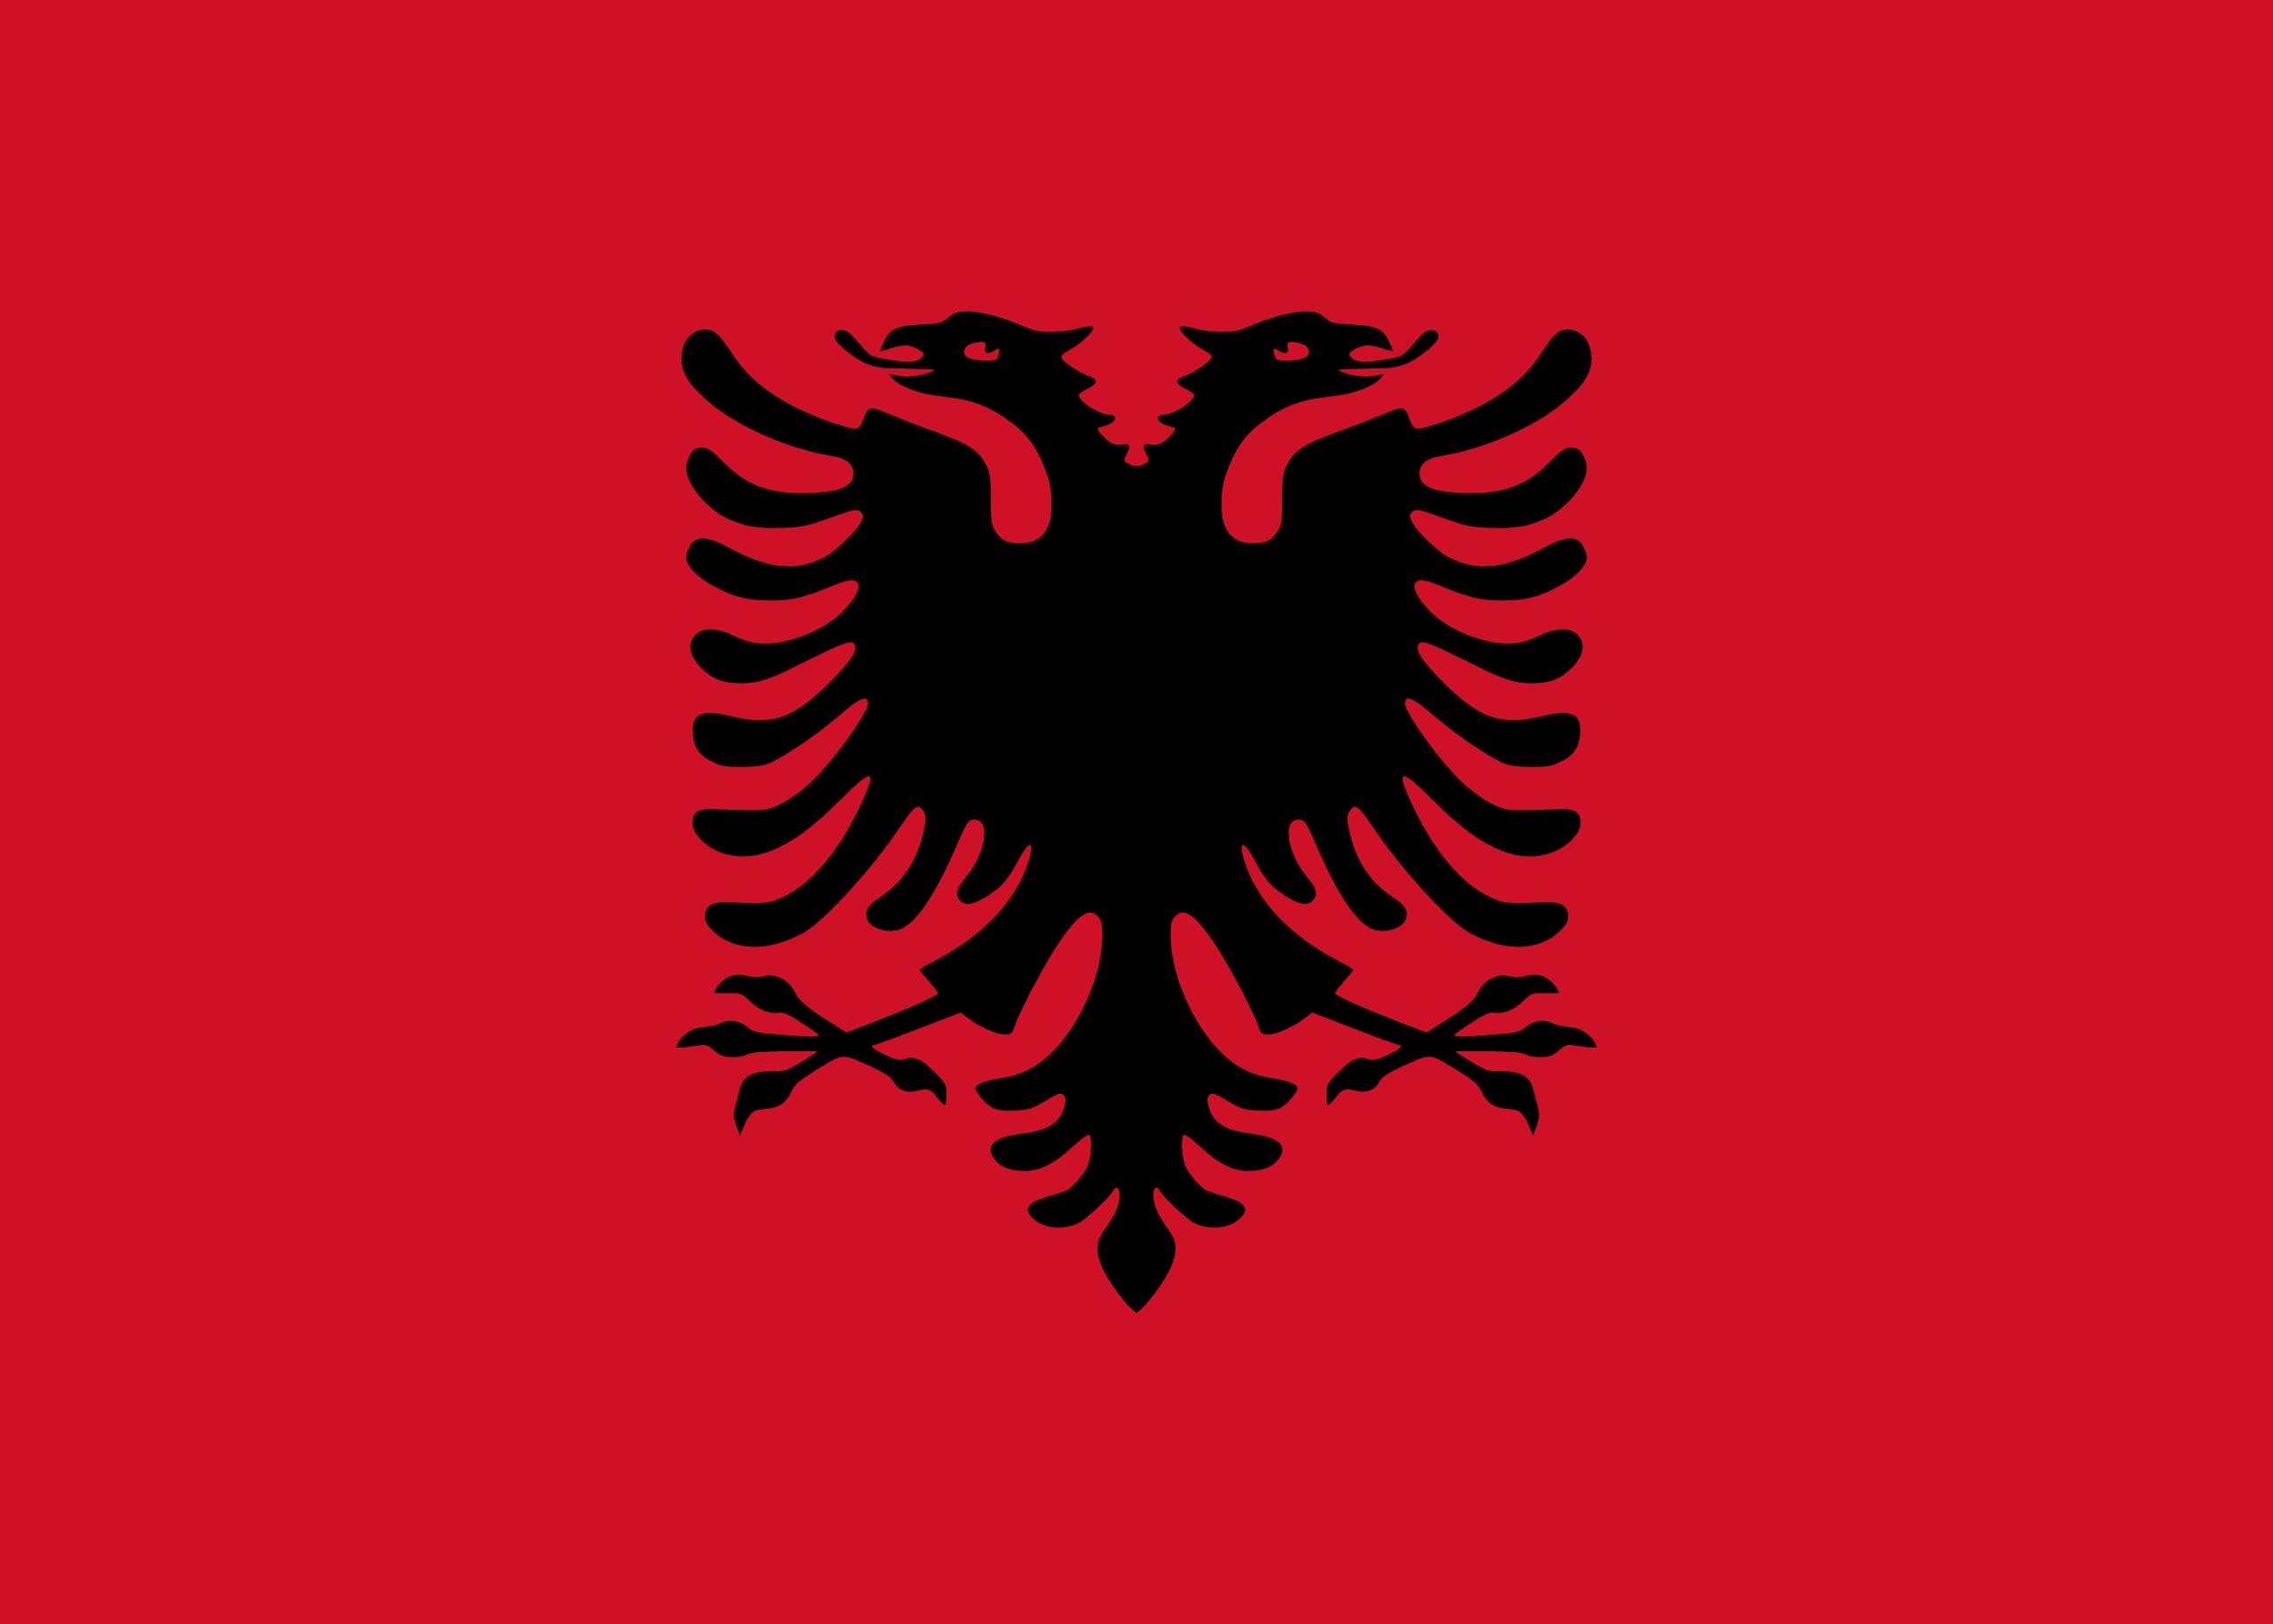 albania, 国家, 会徽, 徽标, 符号 - 高清壁纸 - 教授-falken.com